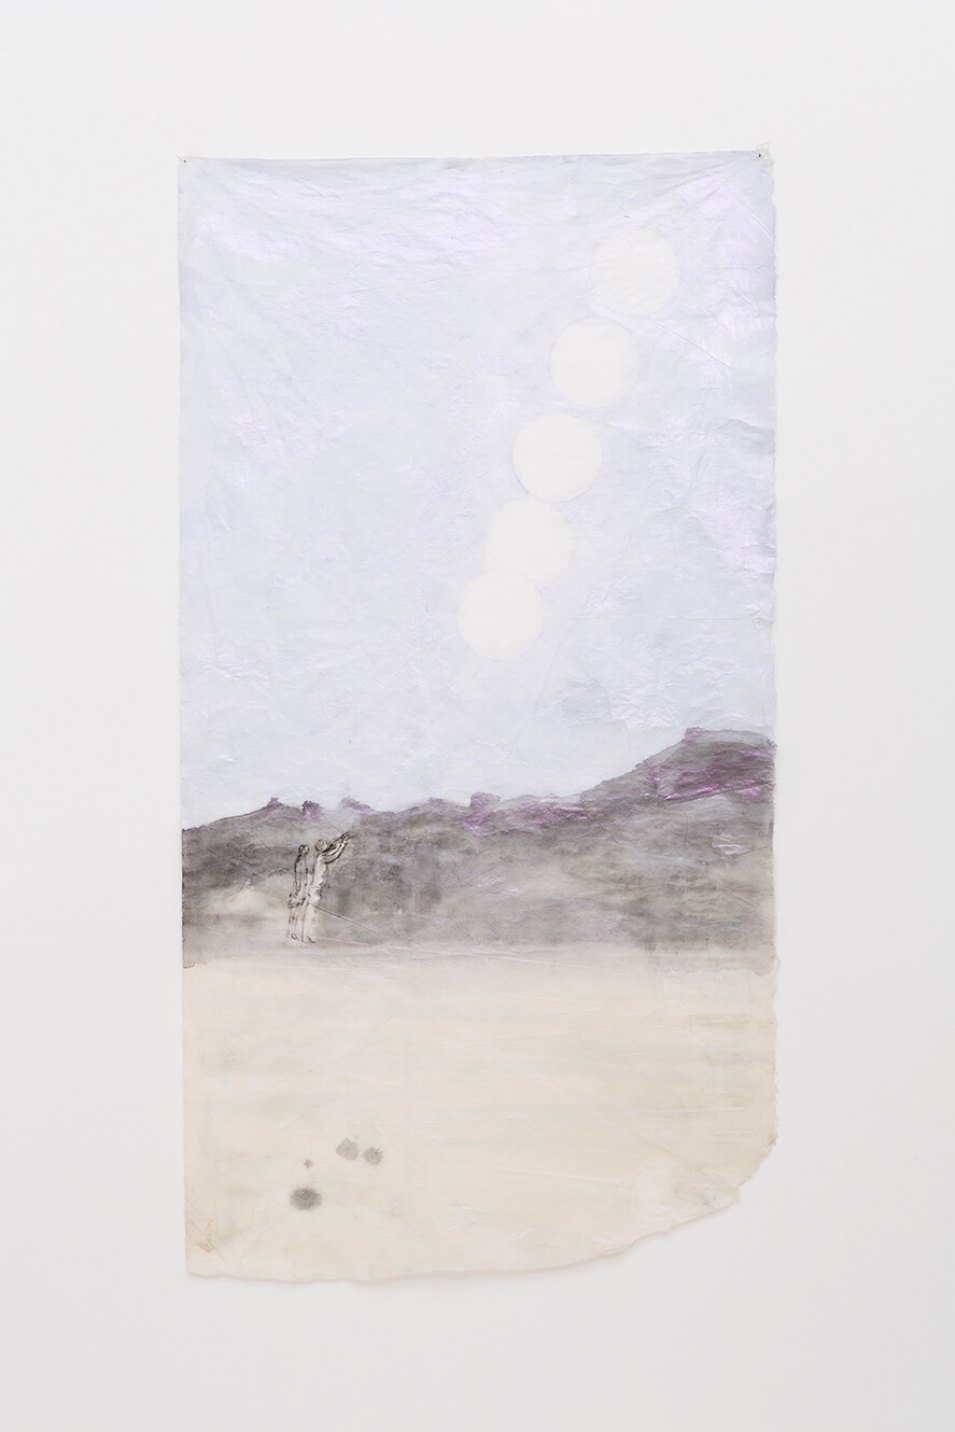 Marina Perez Simão, <em>untitled</em>, 2015, color pencil, acrylic and iridescent pigment on korean paper, 138 × 73 cm - Mendes Wood DM